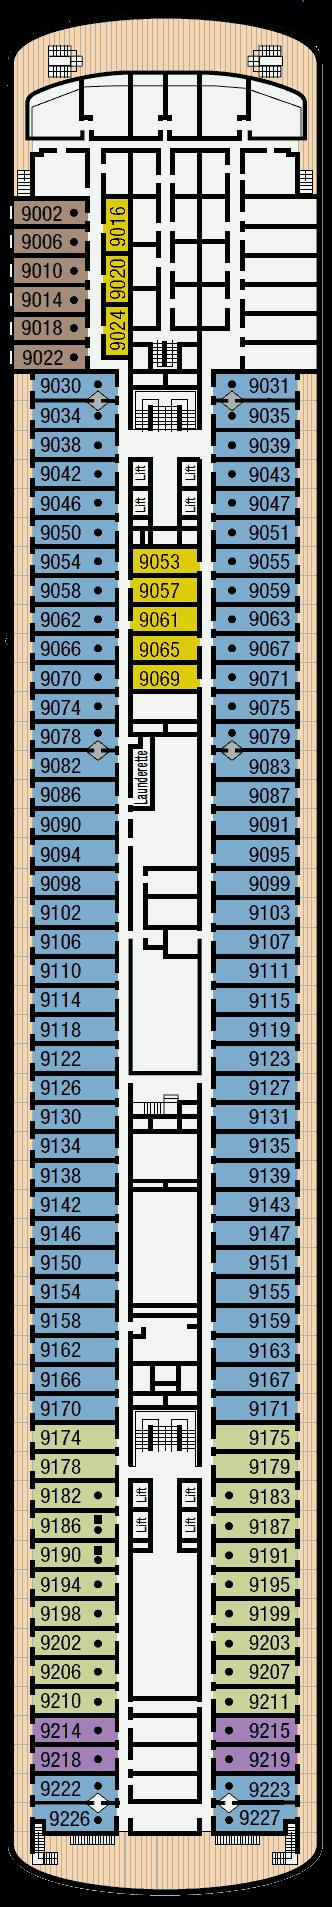 Pacific Aria Deck 9